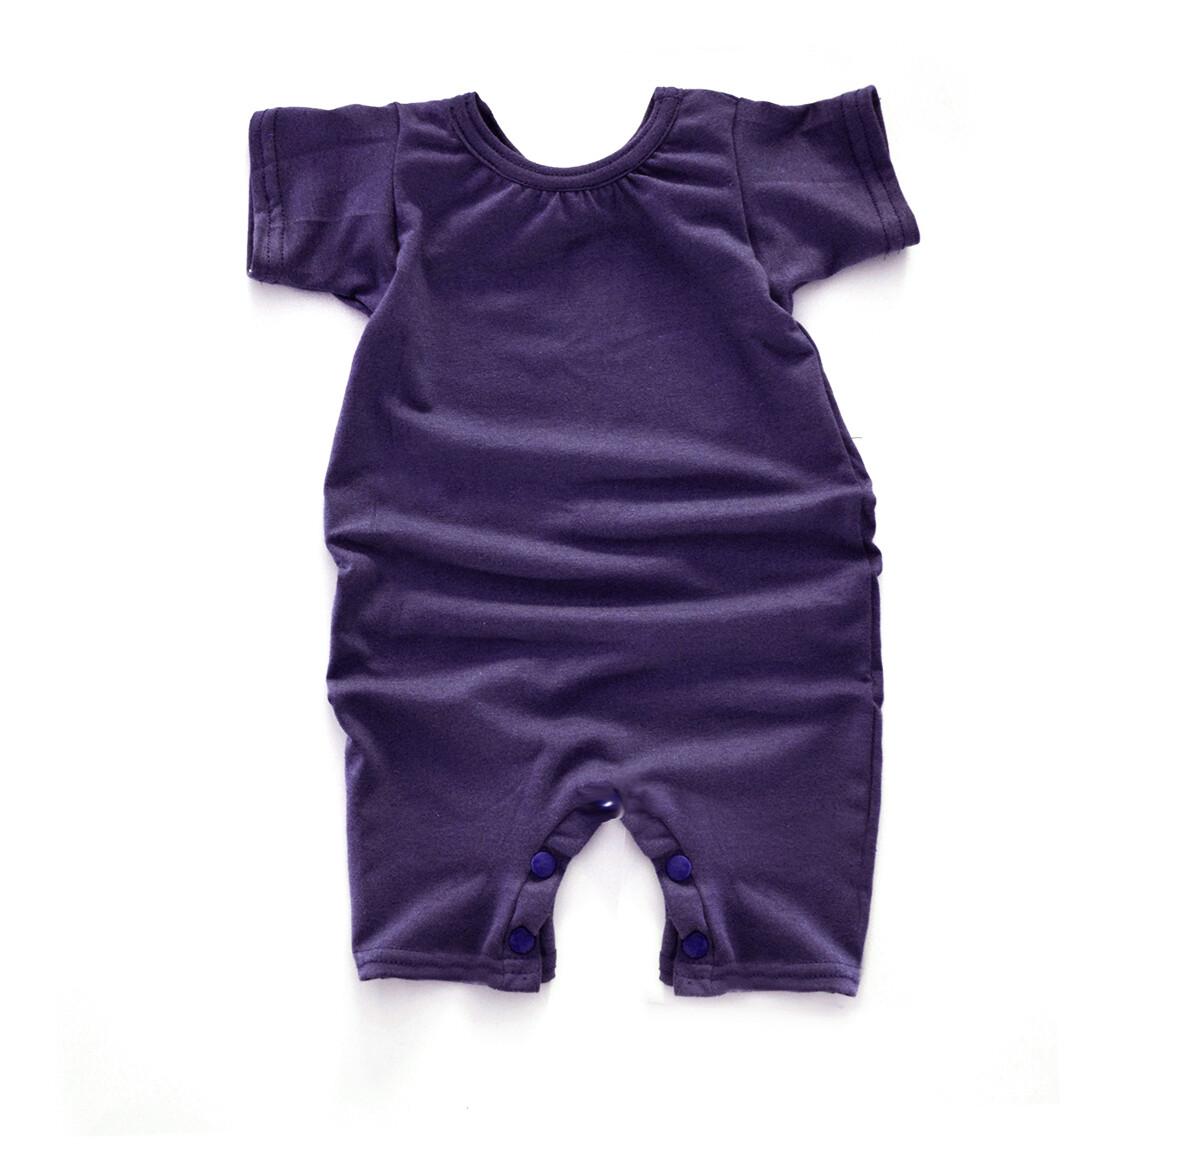 Little Sprout Short Sleeve Baby Romper - Tencel - Plum